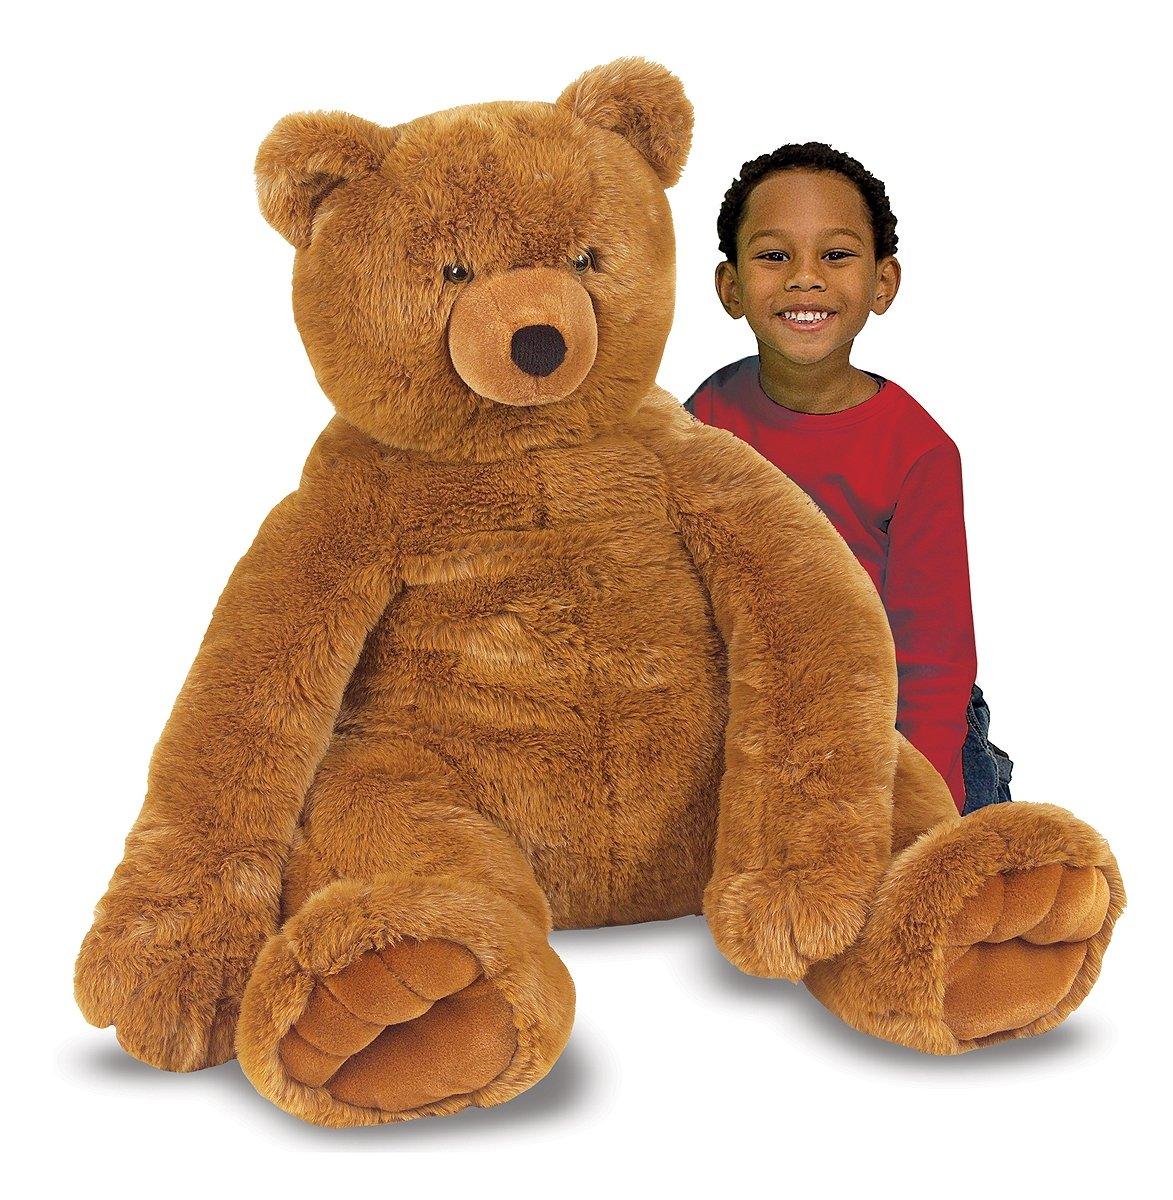 Melissa & Doug Jumbo Brown Teddy Bear